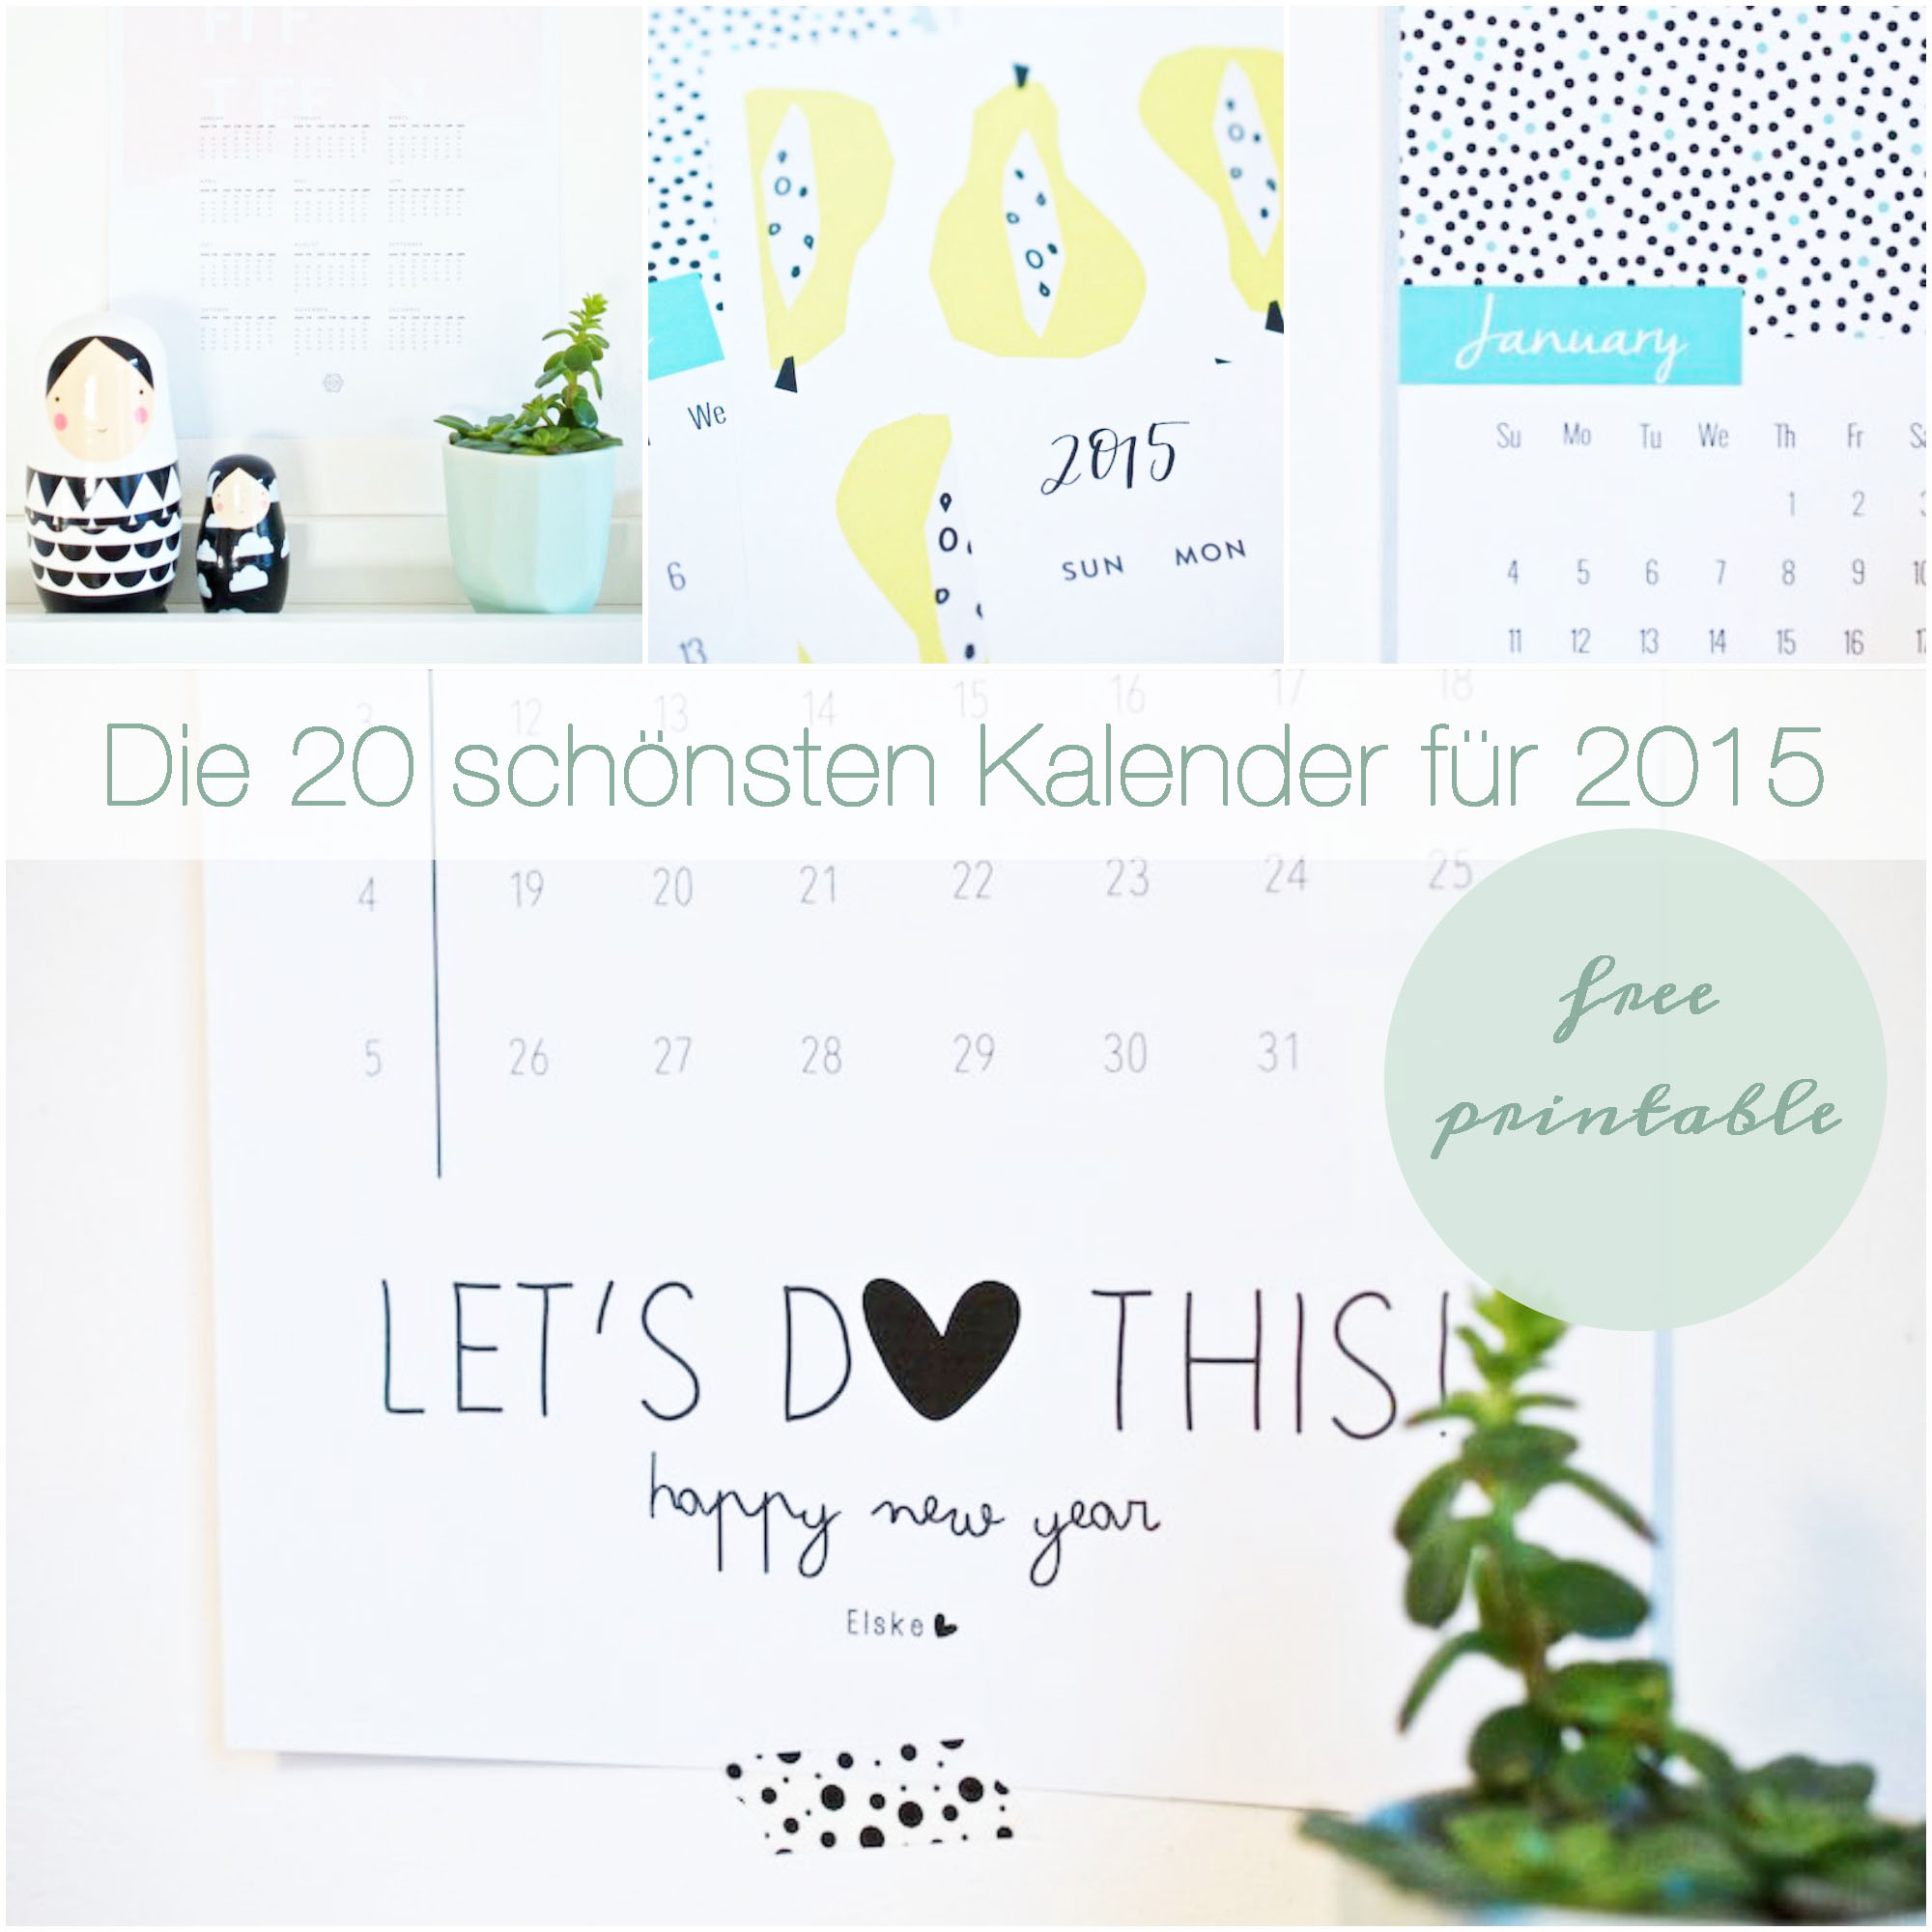 Groß Monatliche Kalendervorlagen 2015 Fotos - Entry Level Resume ...